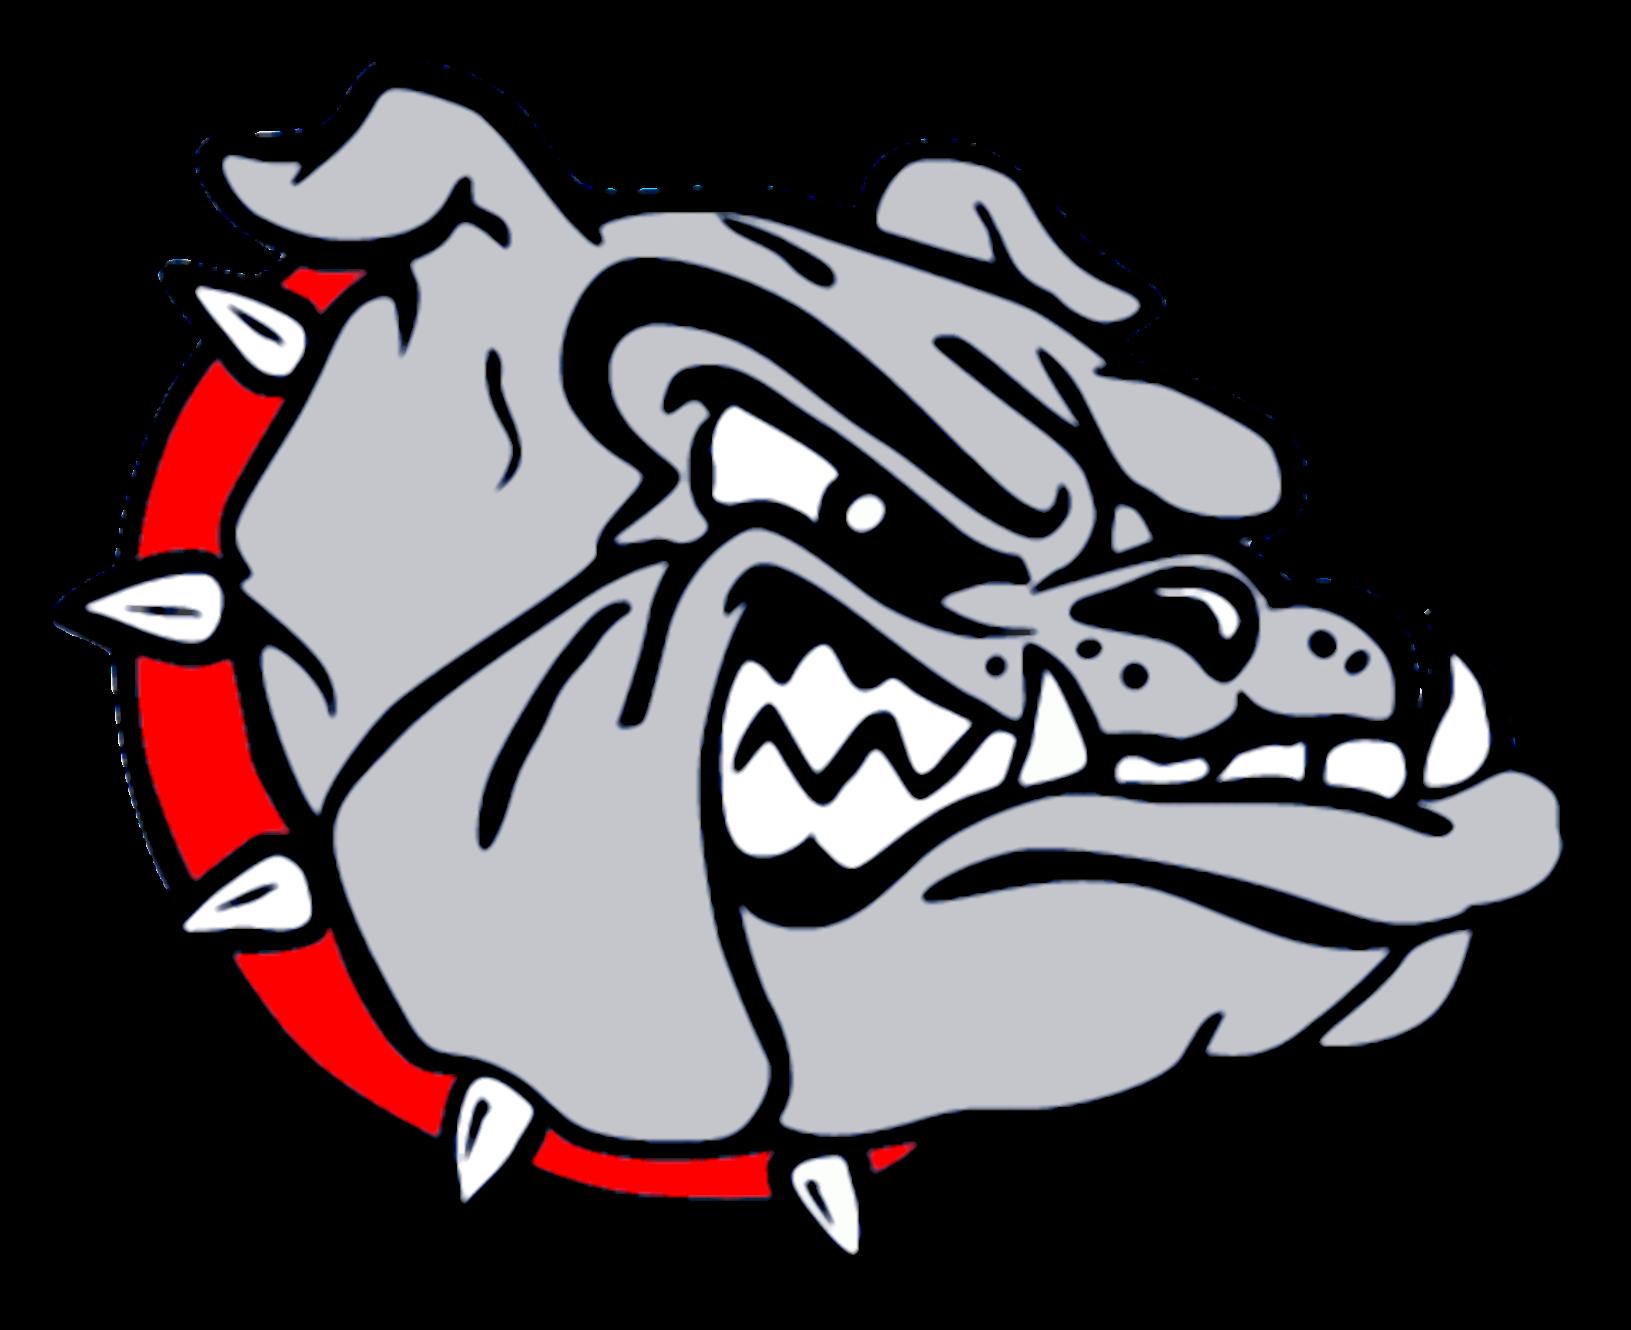 bulldog mascot clipart-bulldog mascot clipart-1